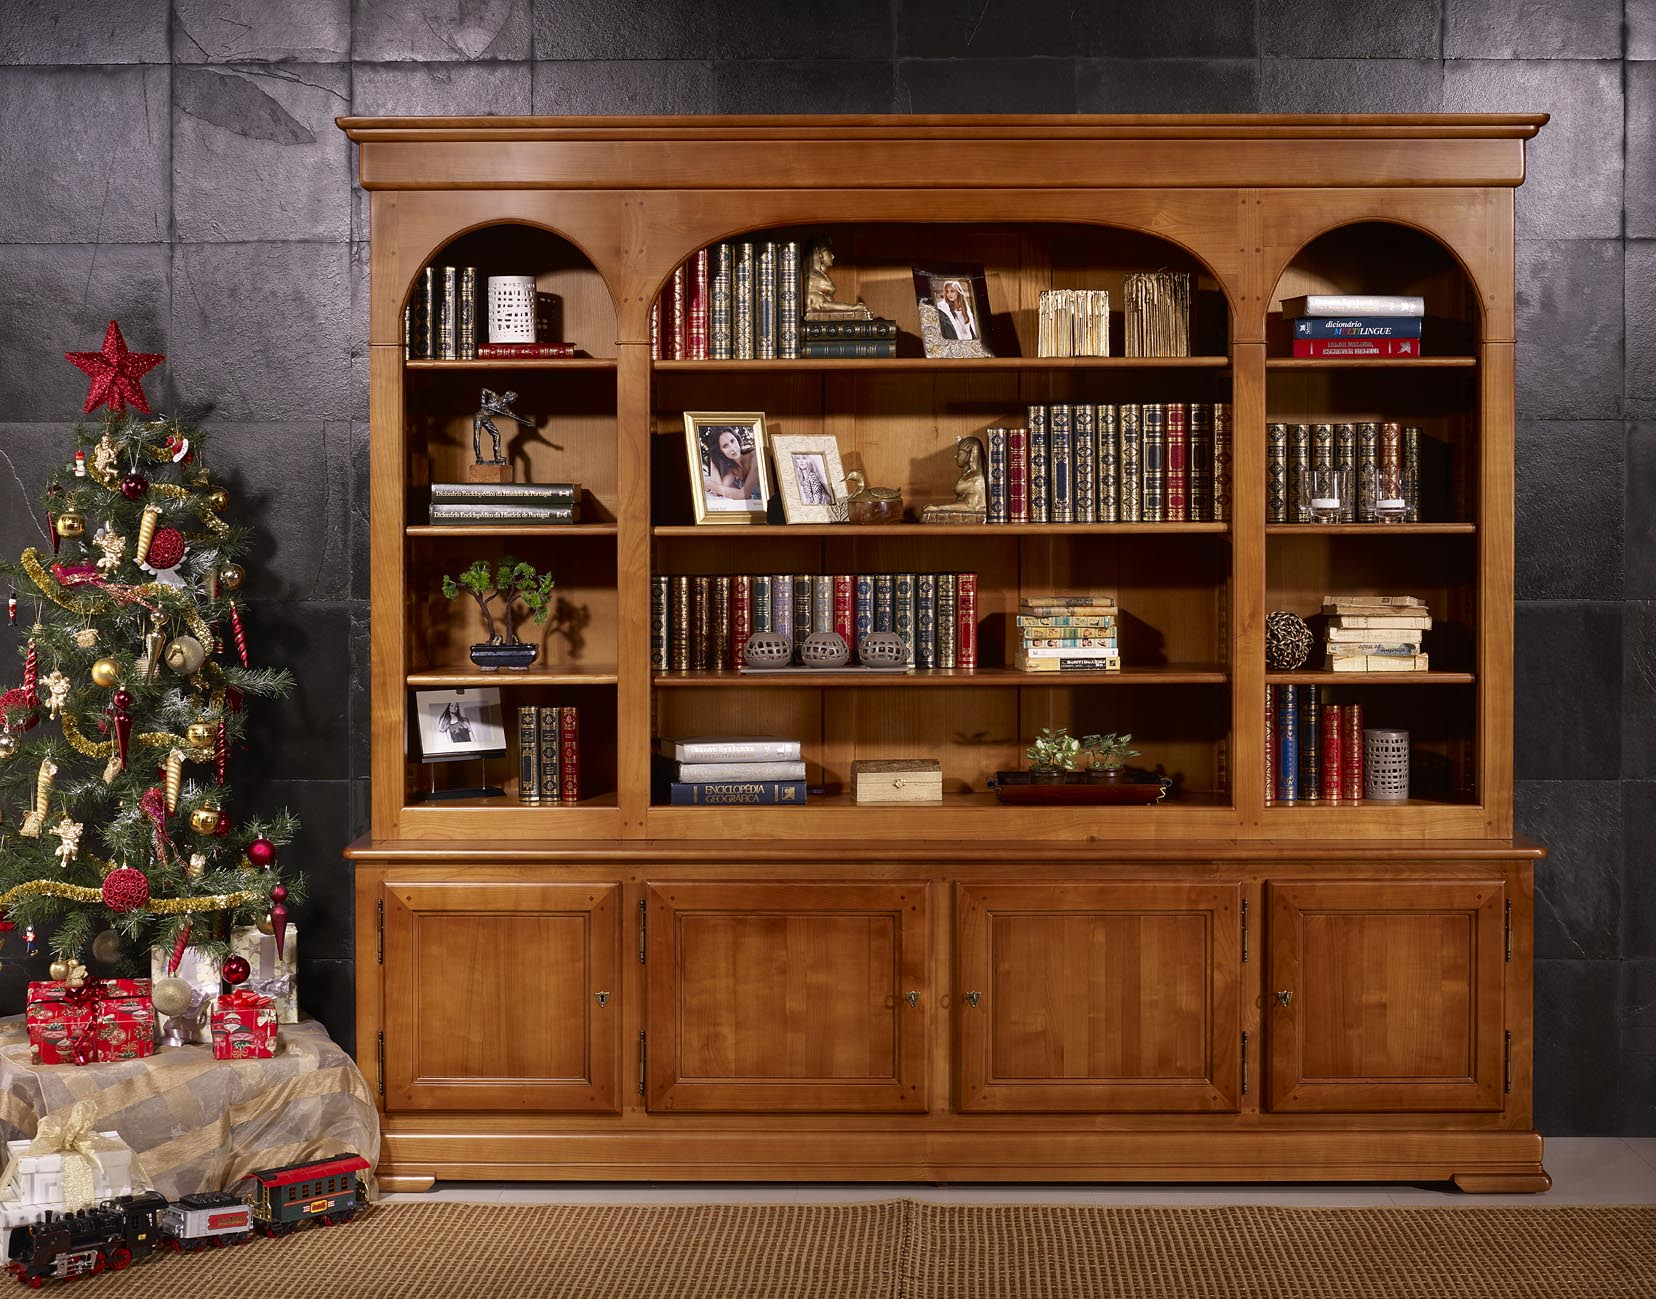 Biblioth que 4 portes h l ne en merisier massif de style louis philippe meuble en merisier - Relooker une bibliotheque en merisier ...